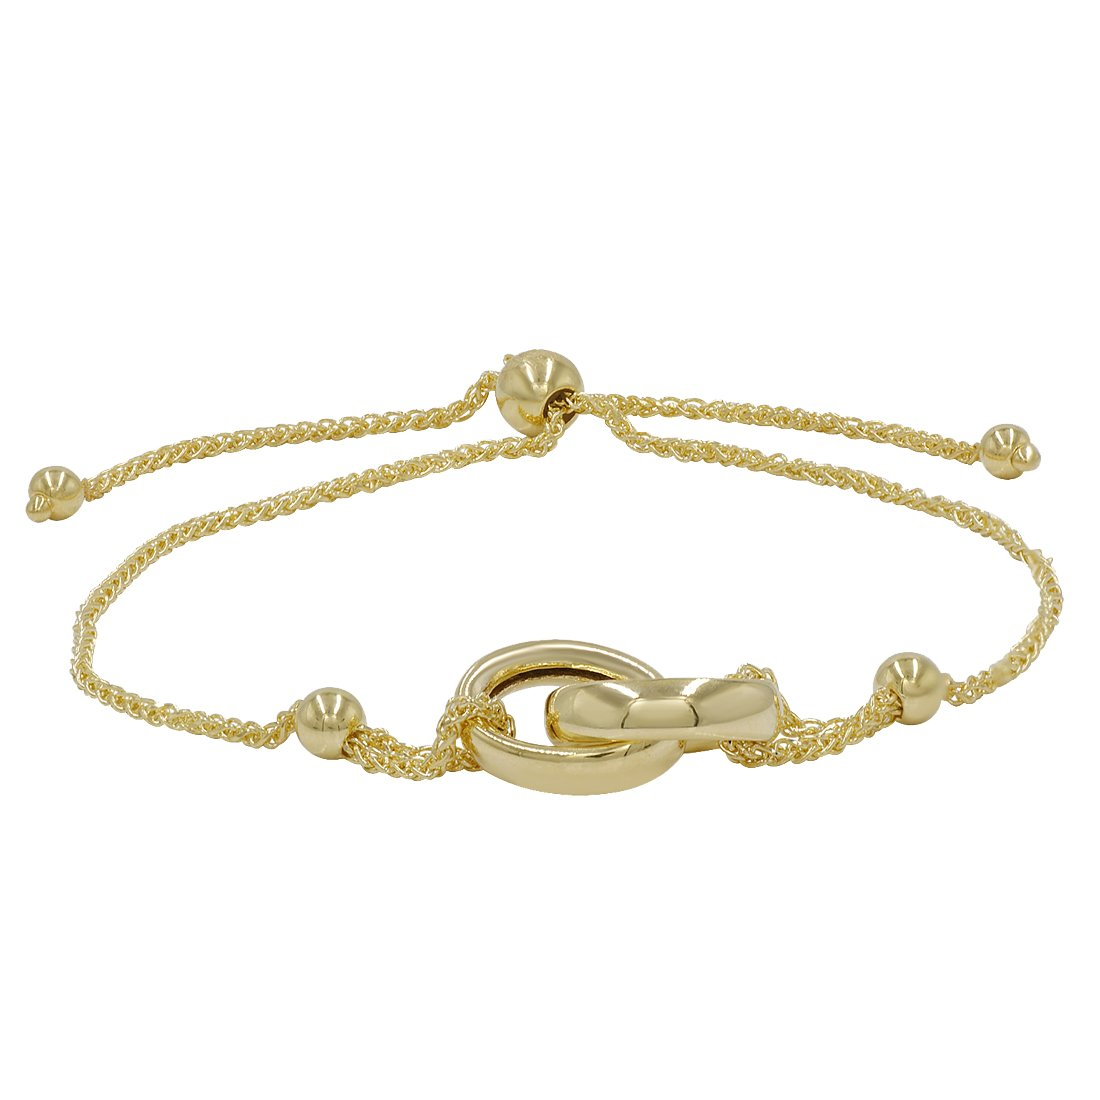 Amanda Rose Interlocking Circle Bolo Bracelet in 14k Yellow Gold (Adjustable) by Amanda Rose Collection